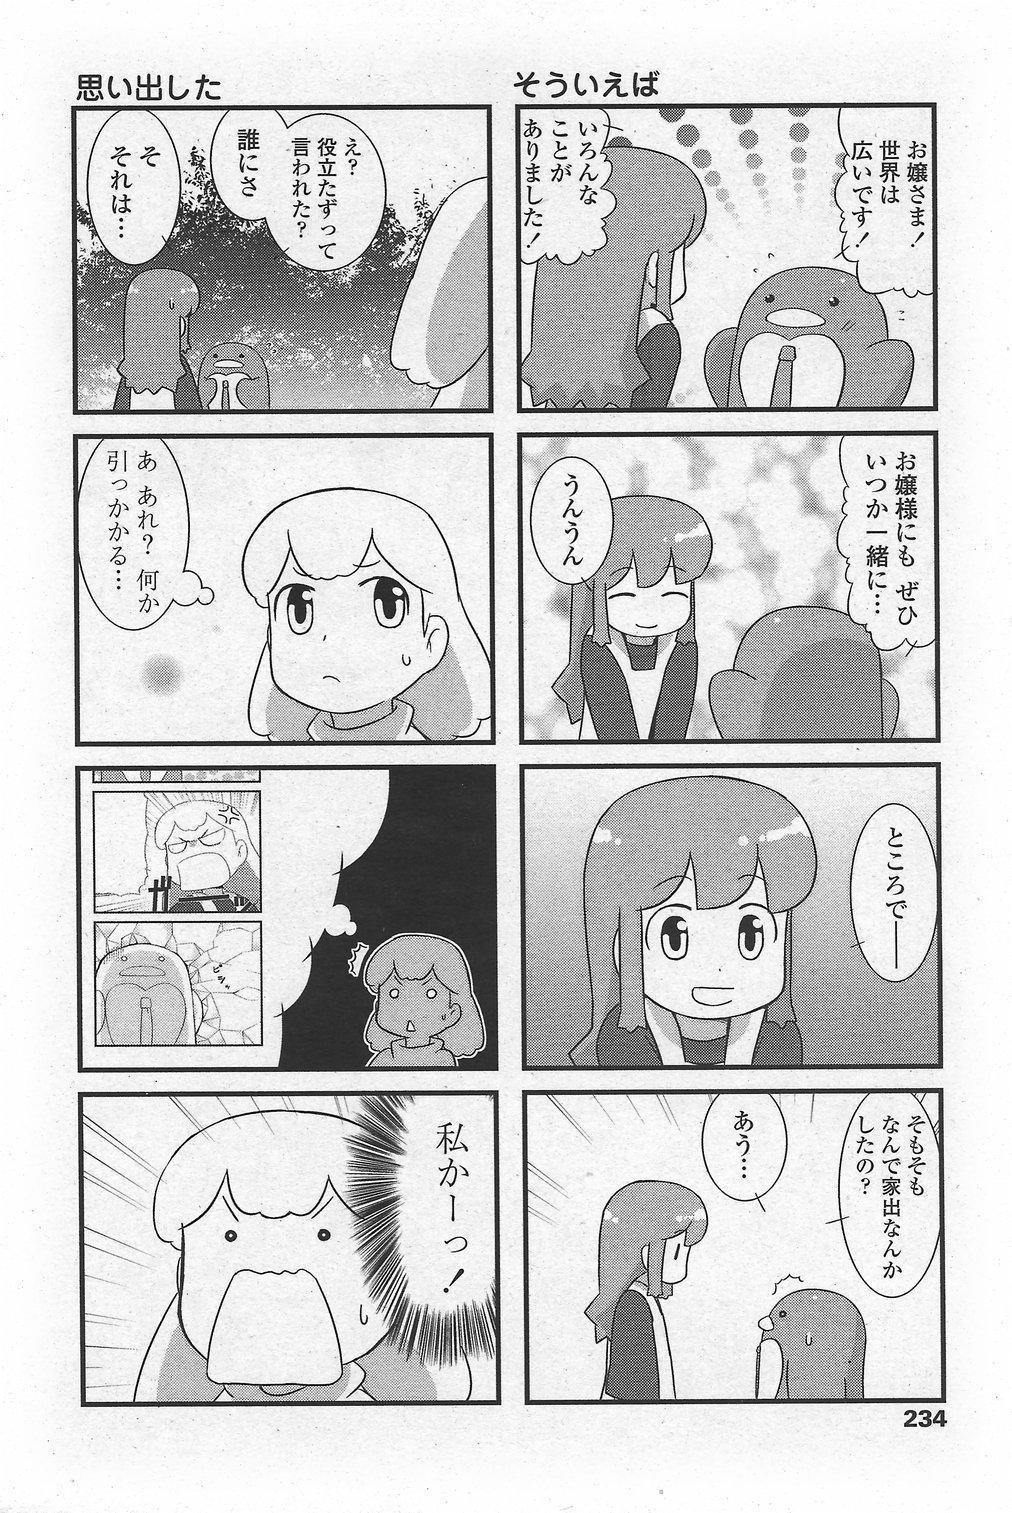 COMIC Penguin Club Sanzokuban 2007-10 Vol. 225 235